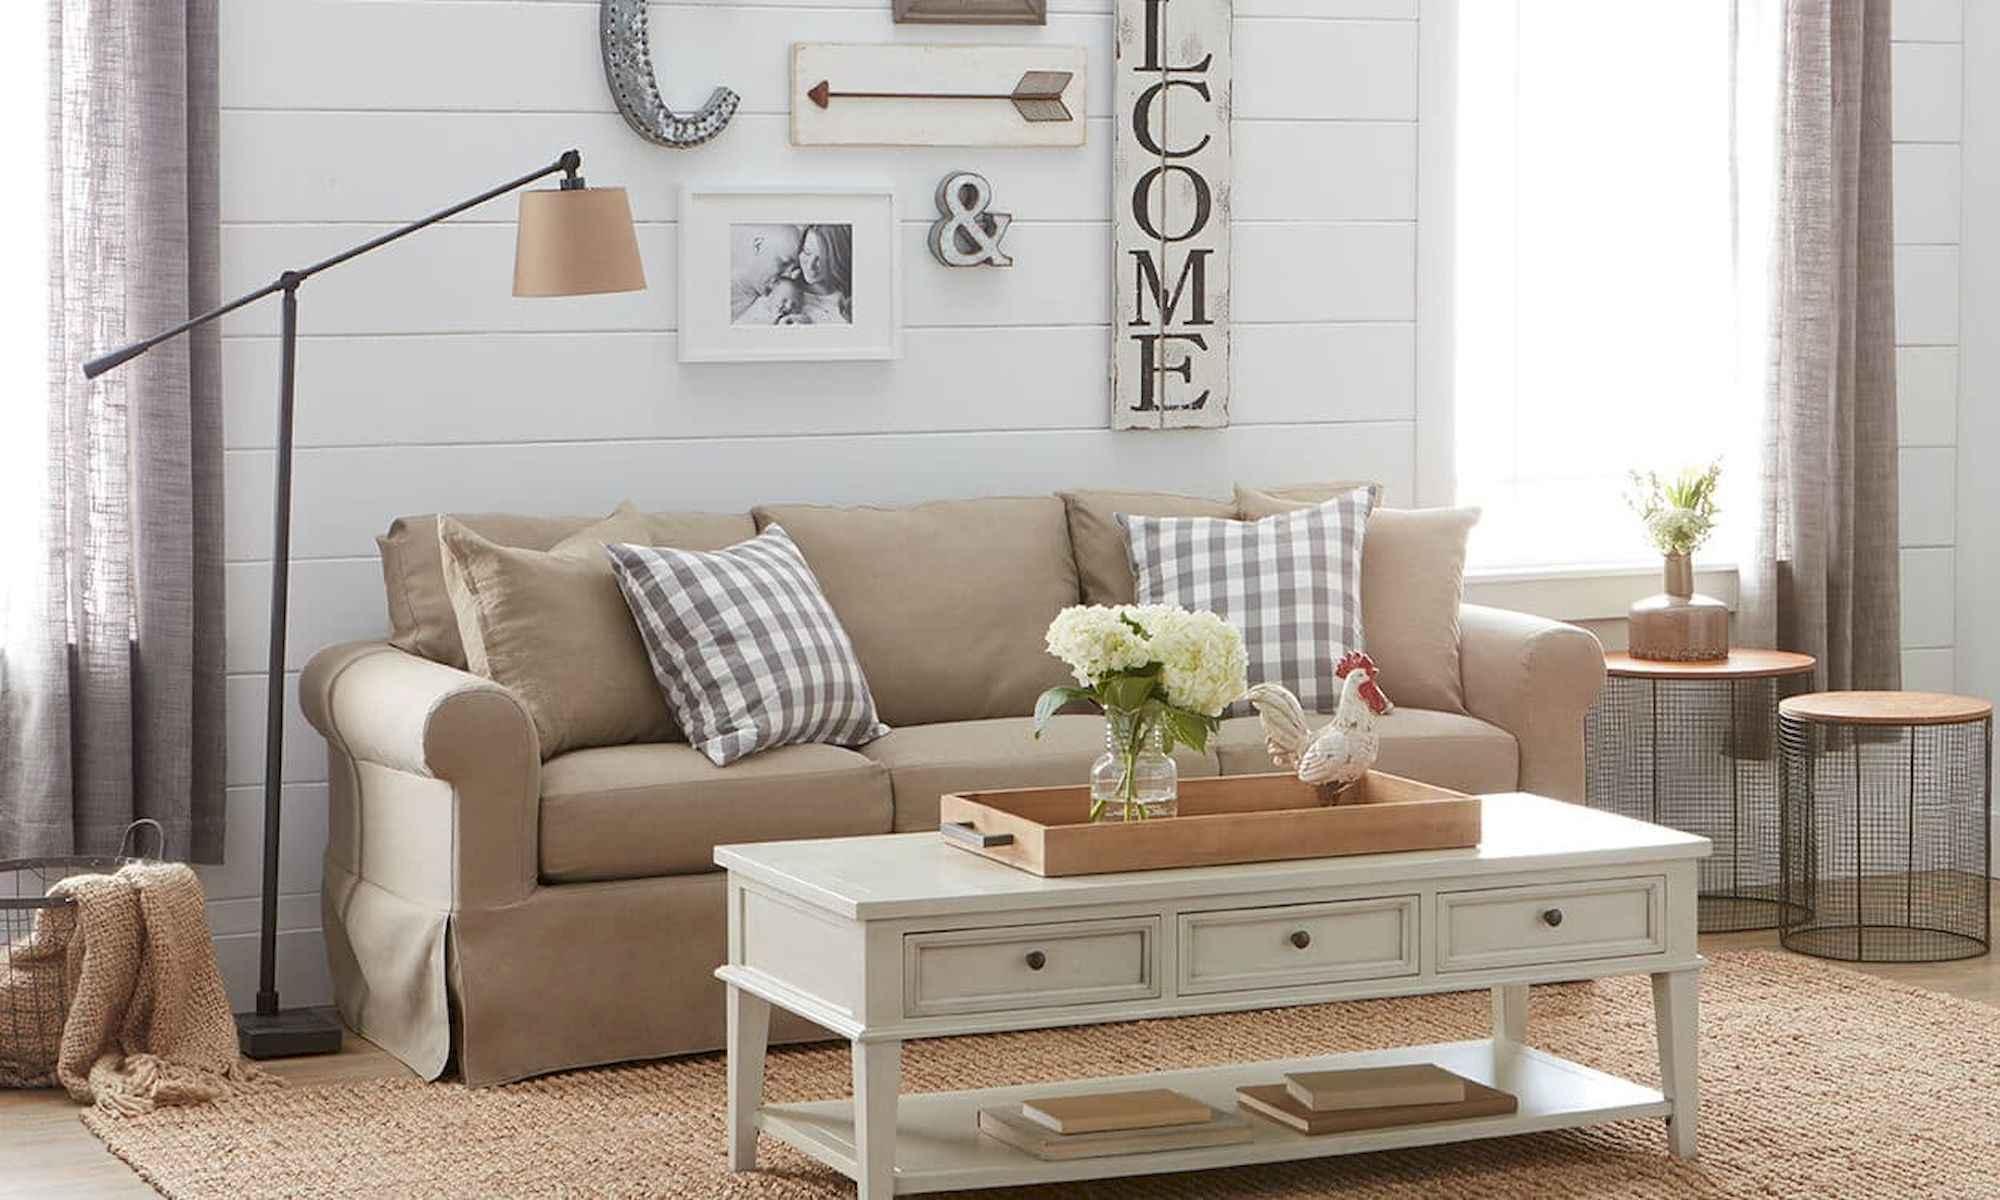 farmhouse living room images modern curtain for 50 rustic decor ideas coachdecor com 36